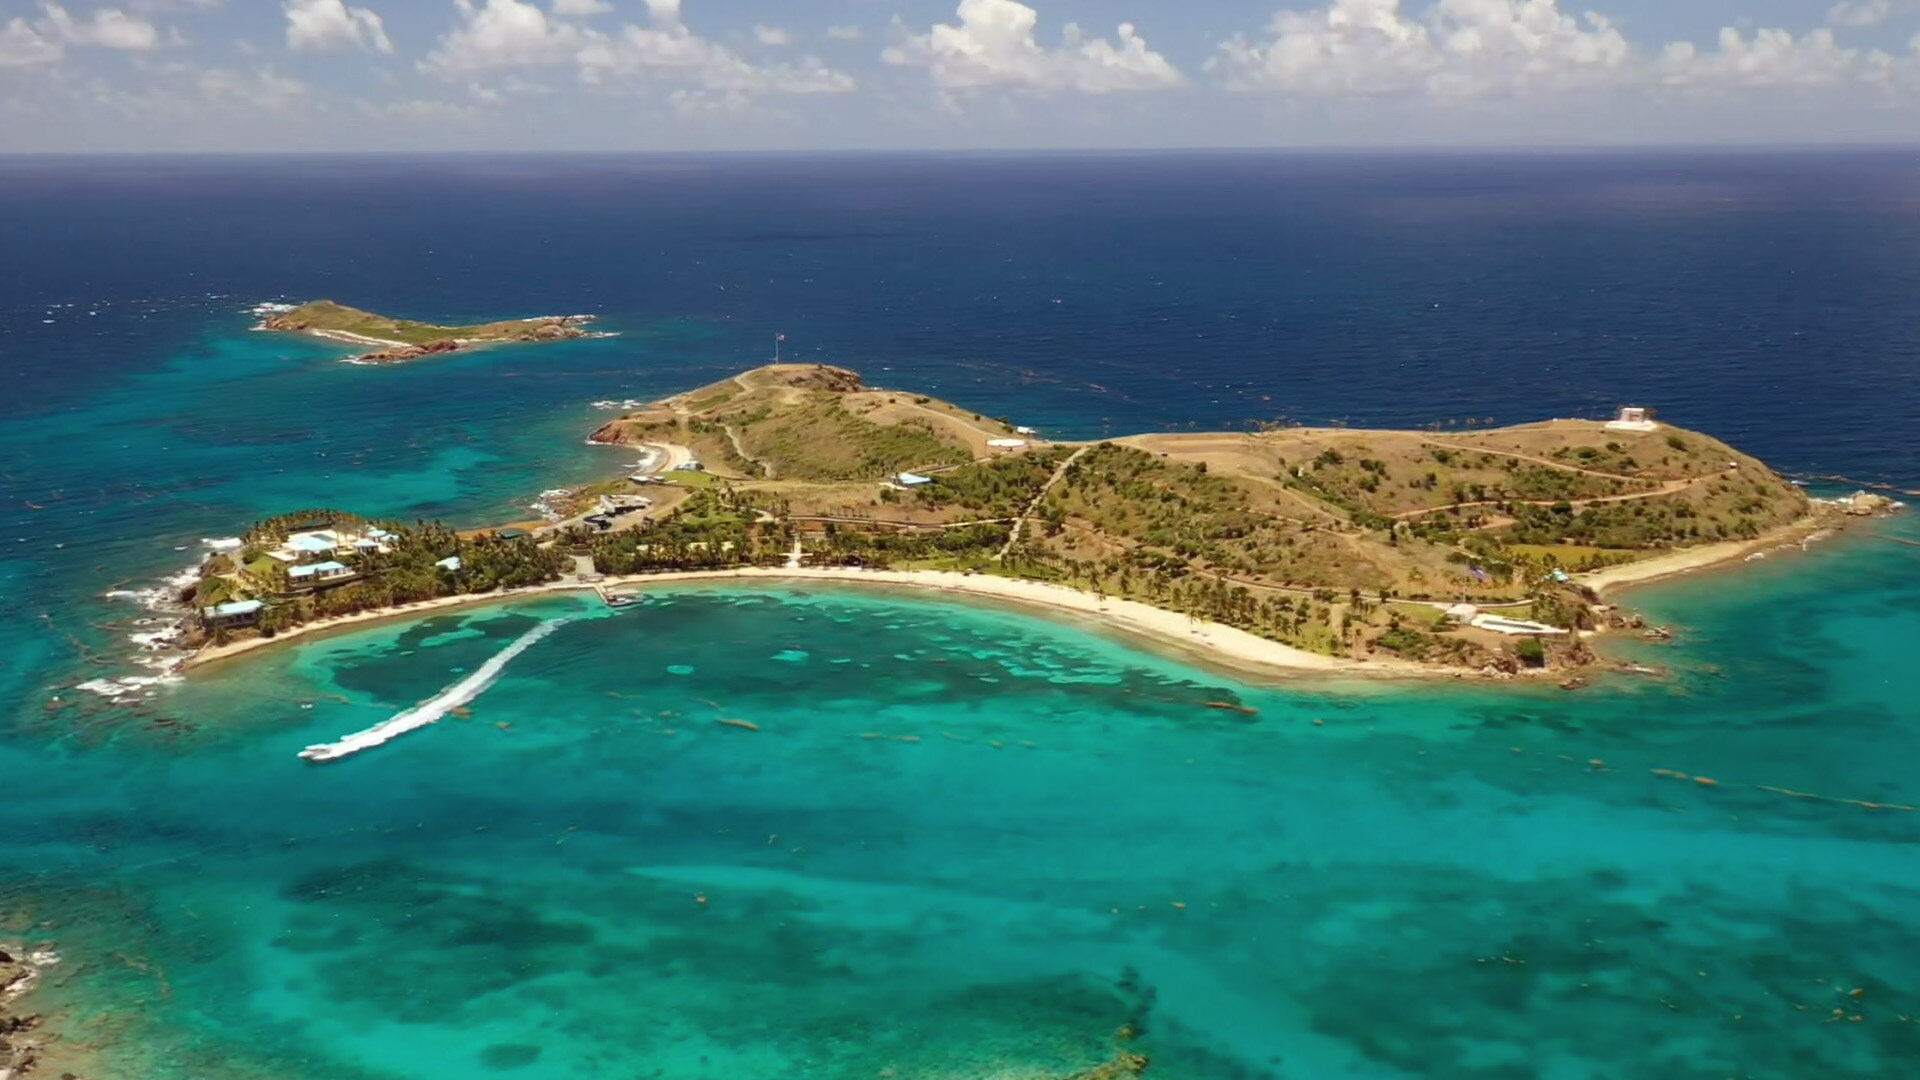 Джеффри Эпштейн: Грязный богач — s01e03 — The Island